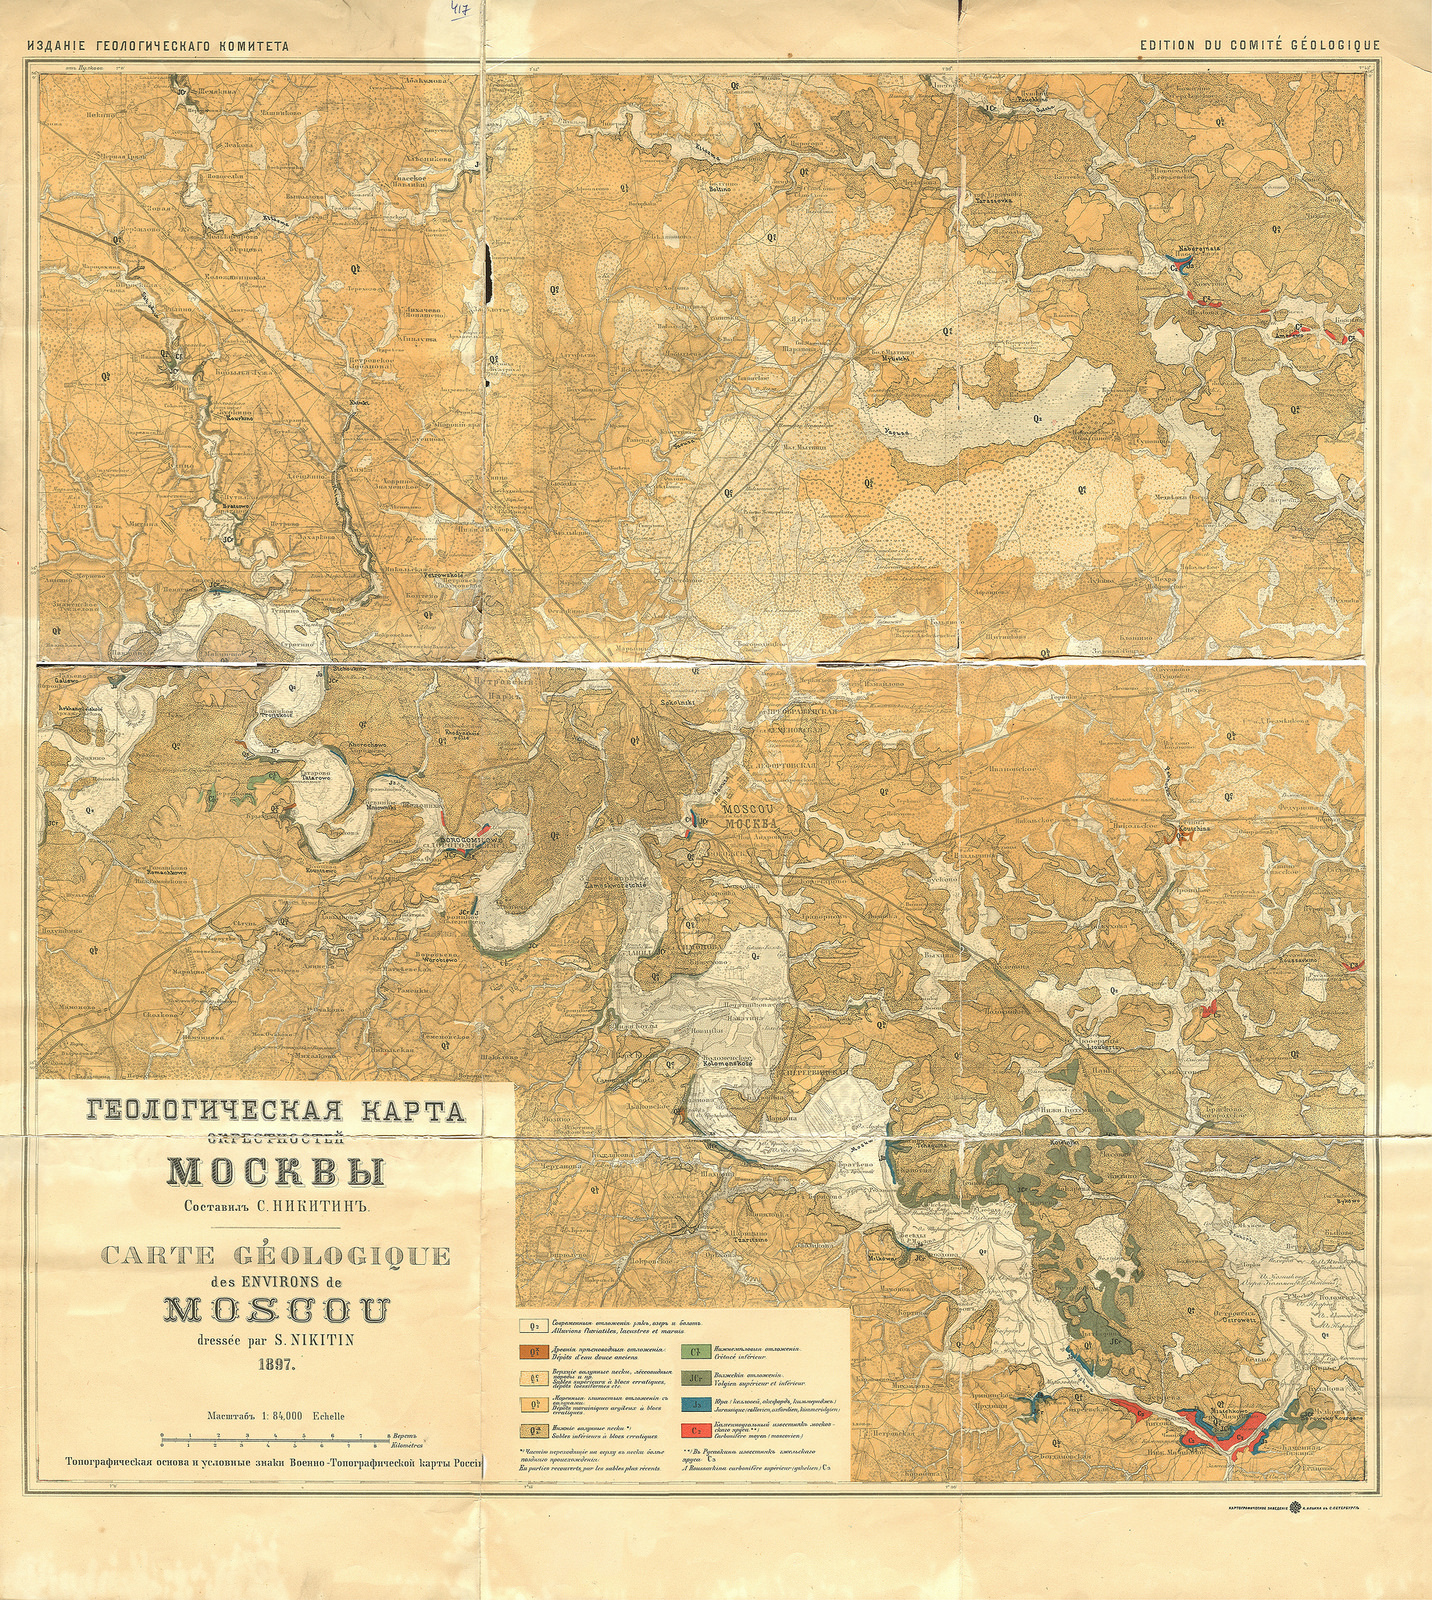 1897_Nikitin_Geology_map_Moscow_1x84000